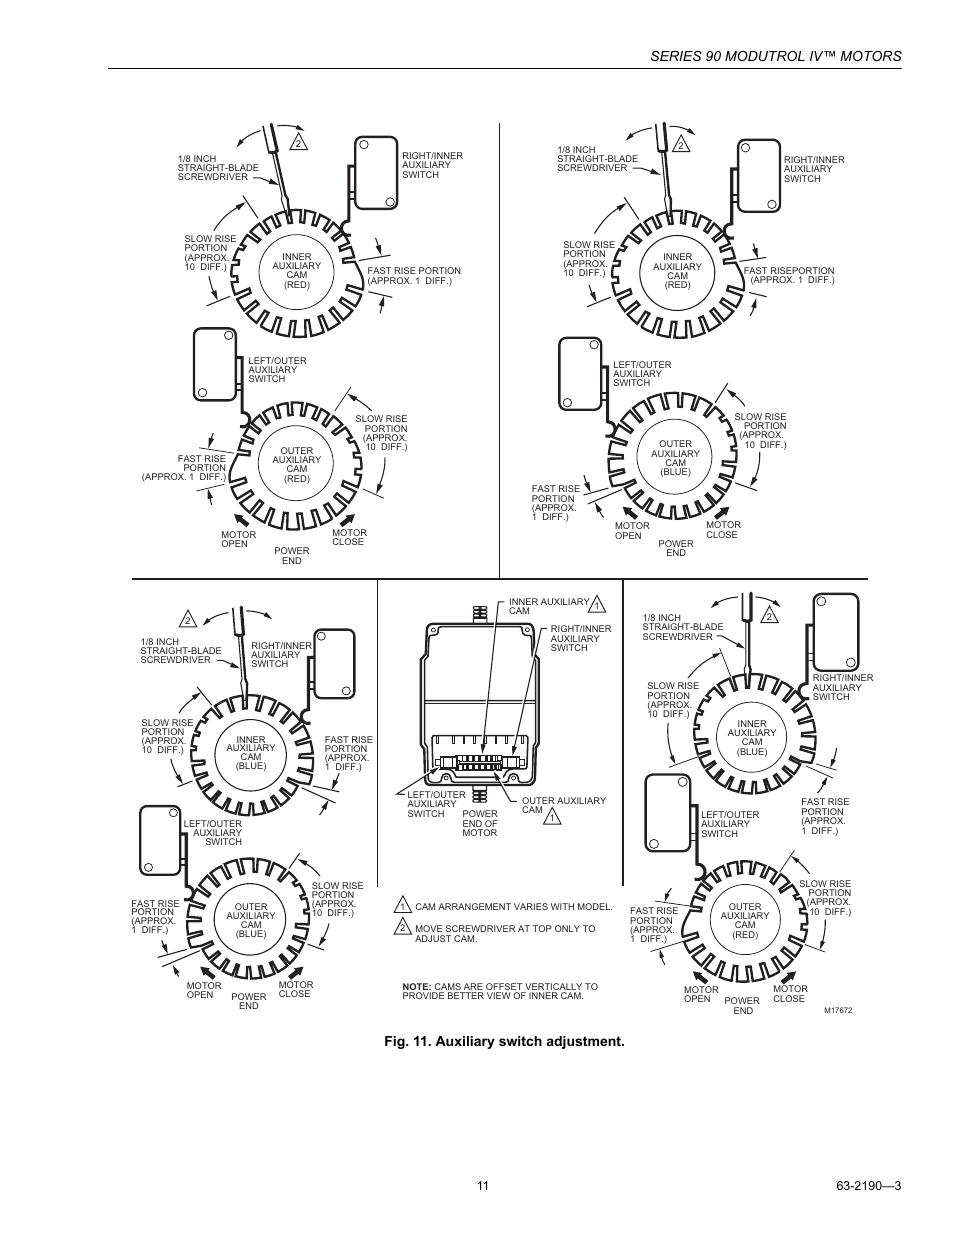 Honeywell Modutrol Wiring Diagram Honeywell Premium Bo Car